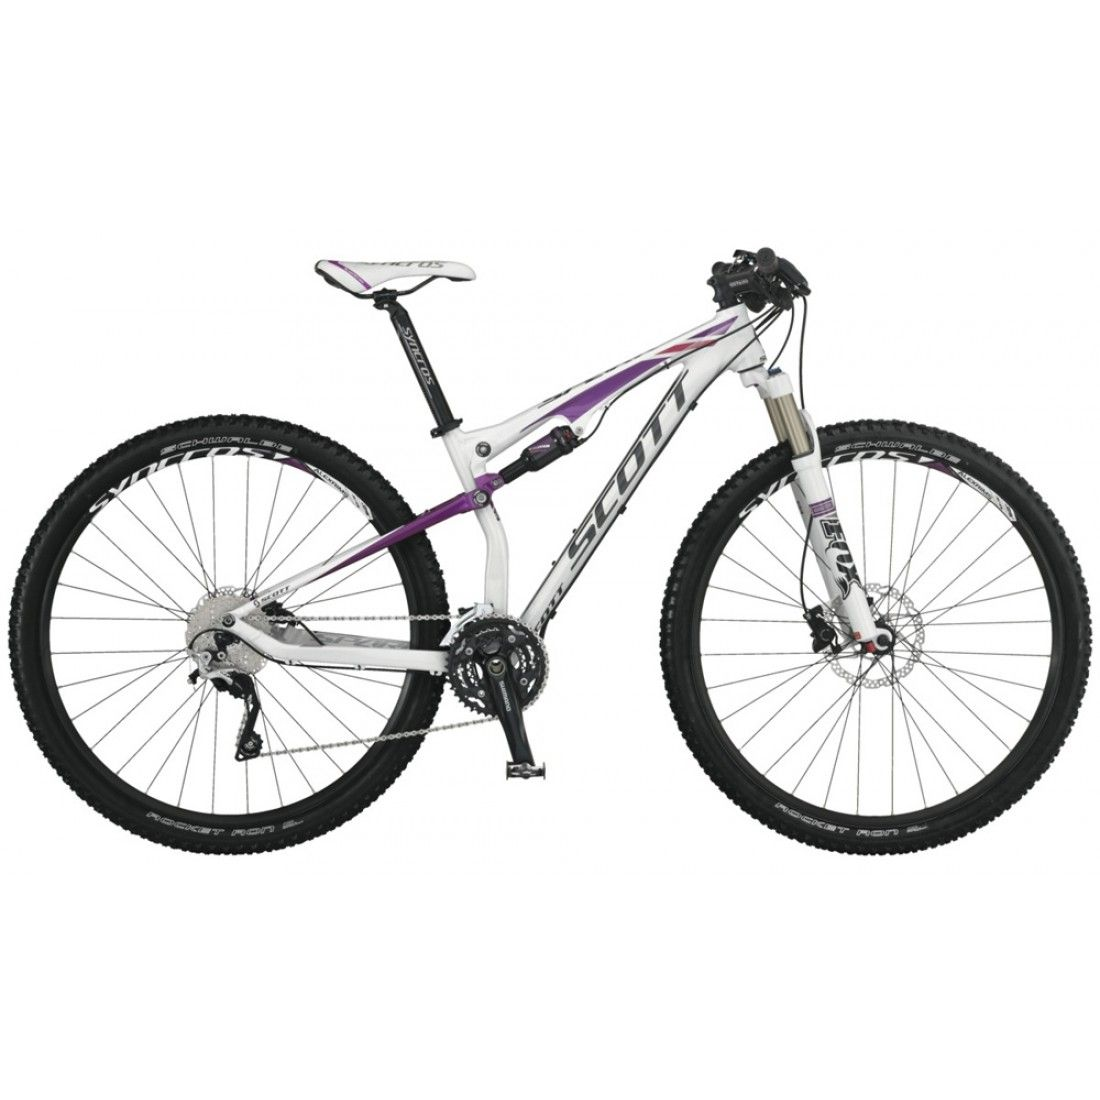 Scott Contessa Spark 900 Womens Mountain Bike 2013 - Full Suspension MTB